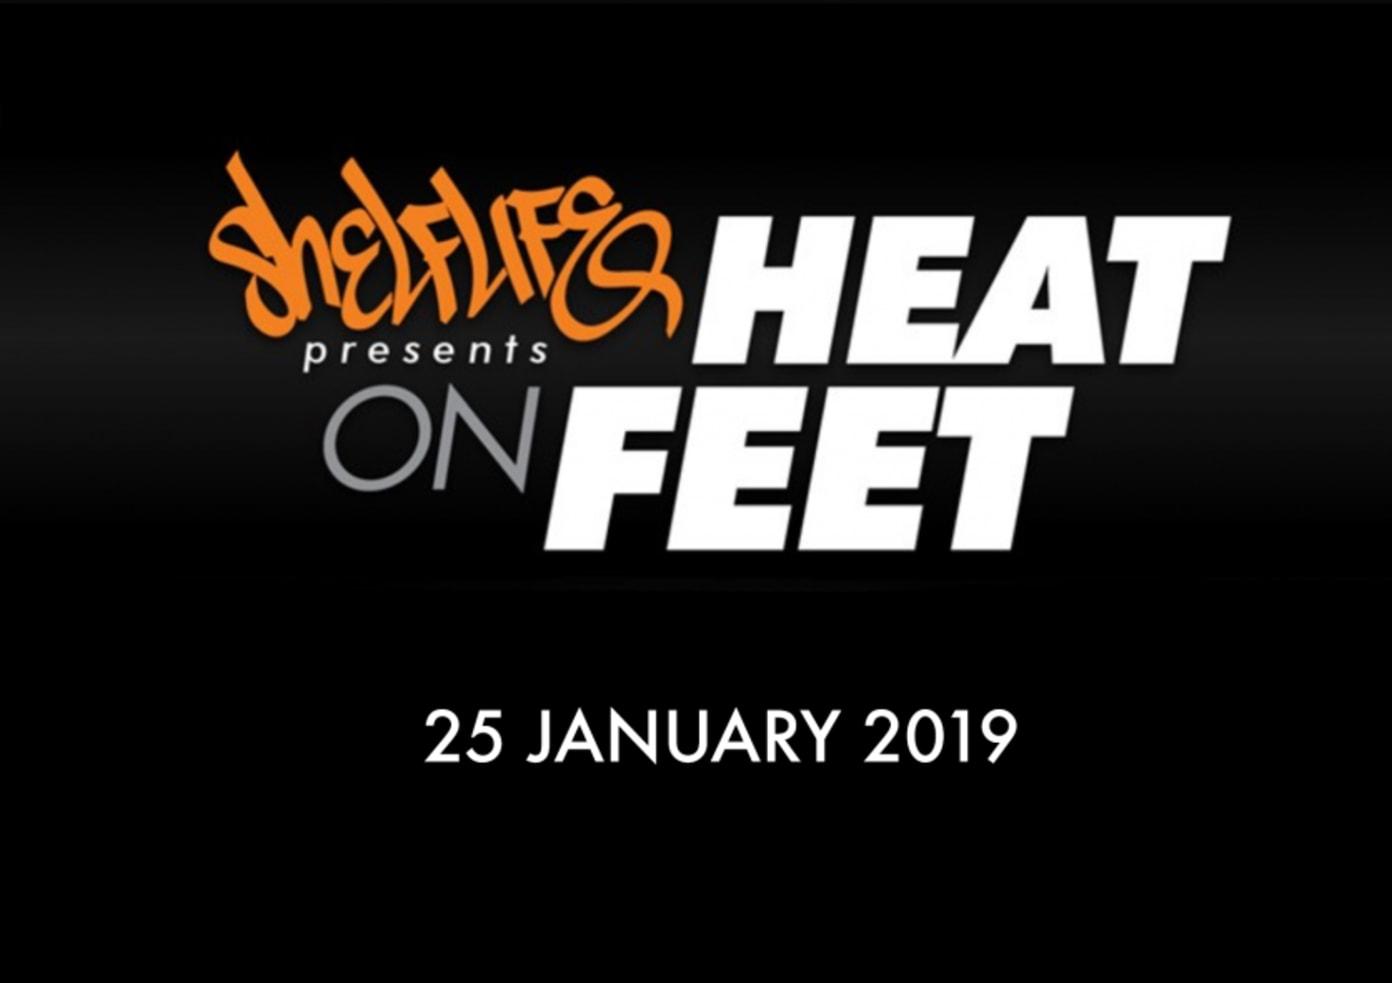 #SLHEAT: 25 January 2019